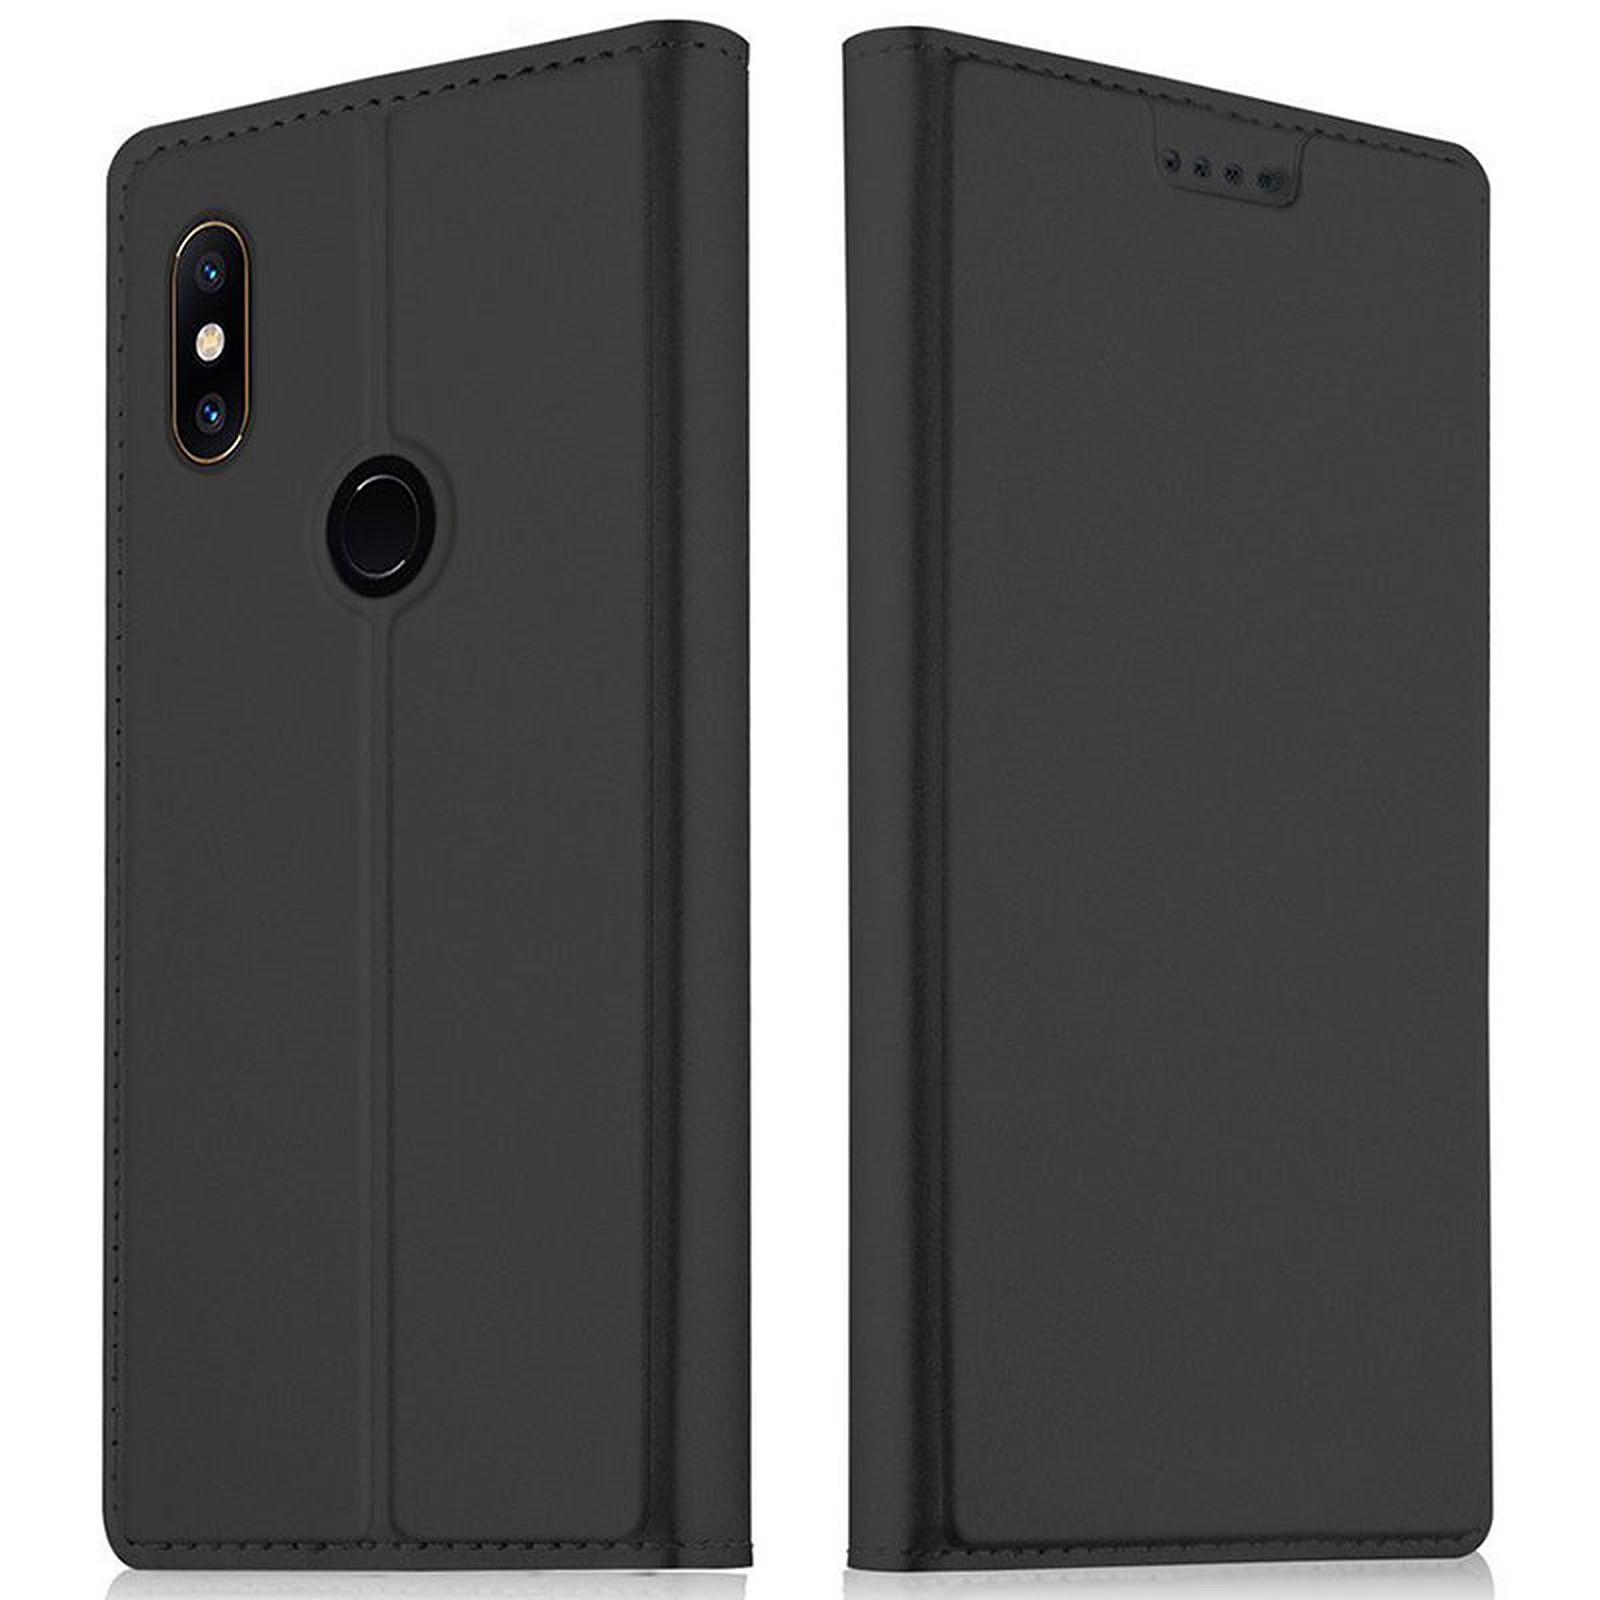 Akashi Etui Folio Porte Carte Noir Xiaomi Redmi S2